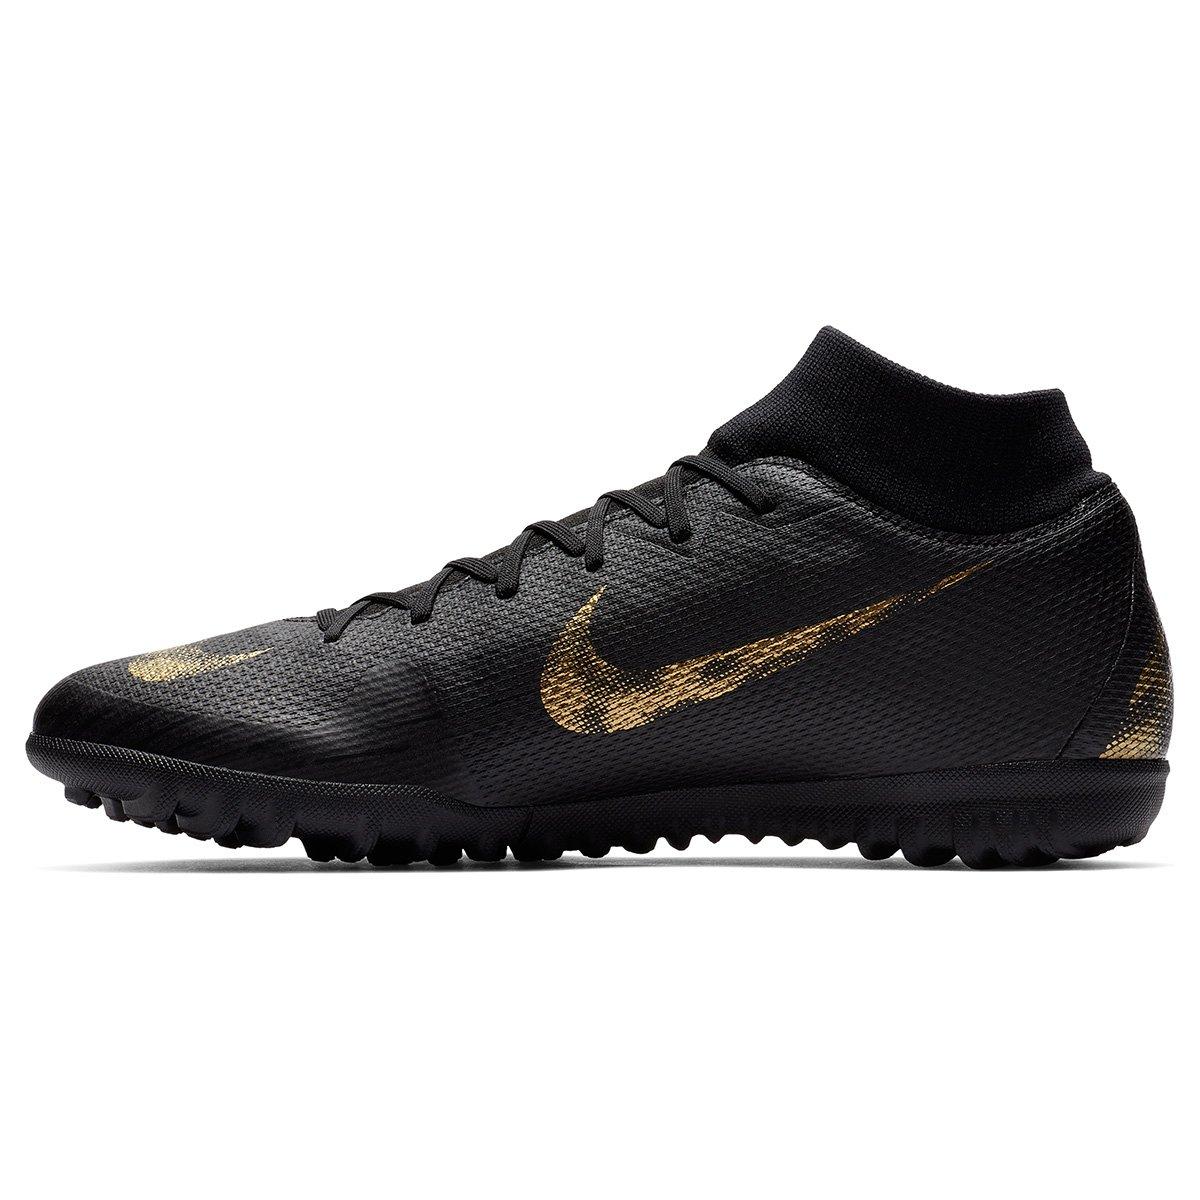 935474debceac Chuteira Society Nike Mercurial Superfly 6 Academy | Livelo -Sua ...